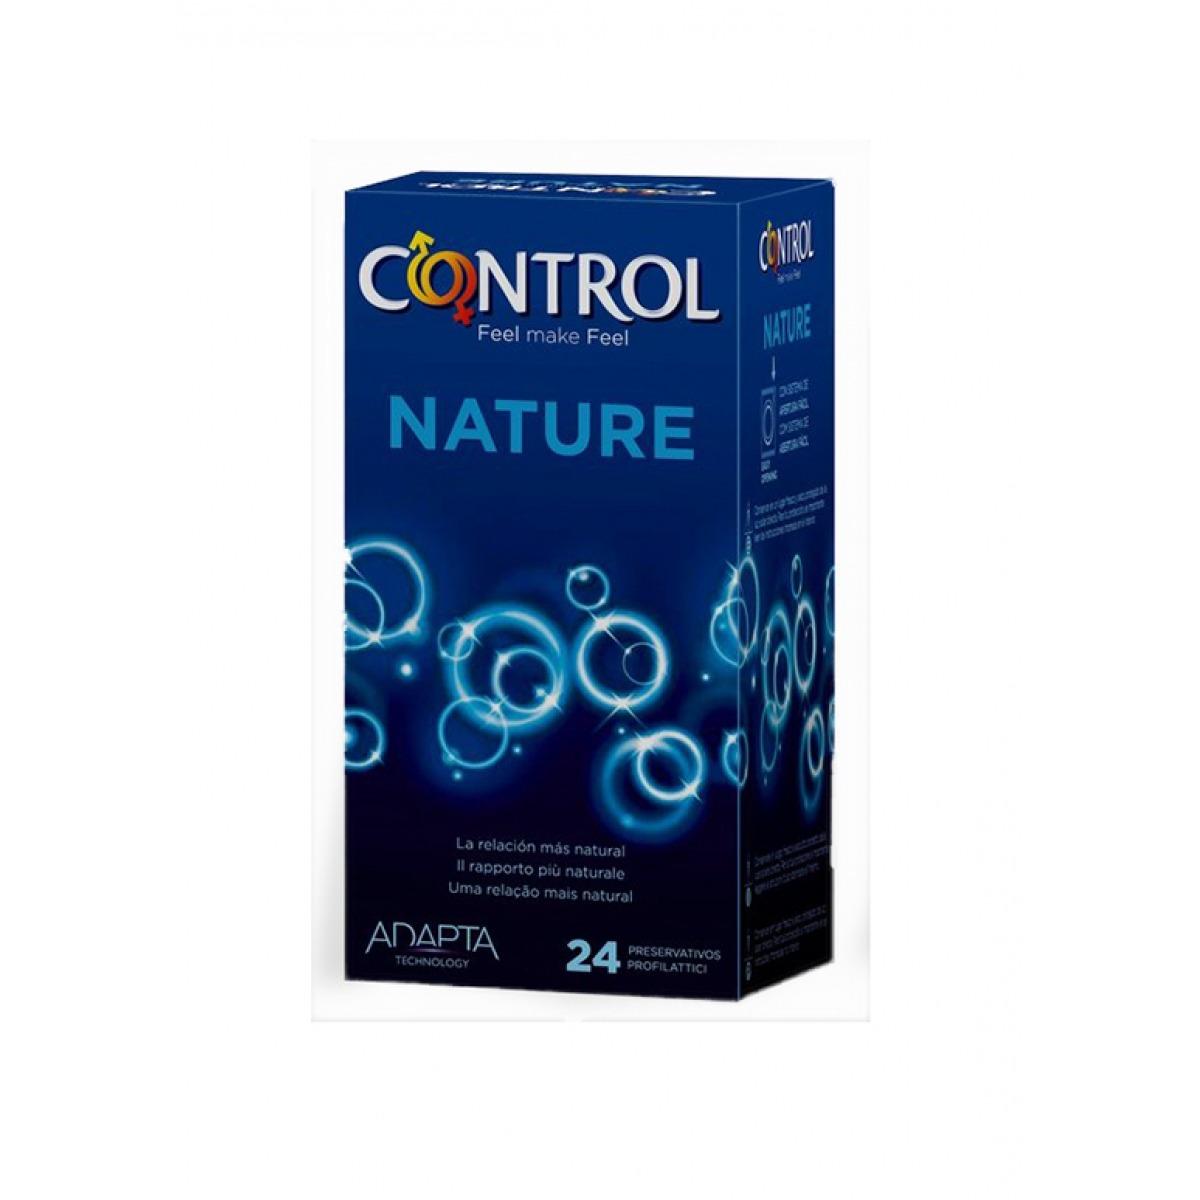 CONTROL NATURE PRESERVATIVOS 24 UNIDADES.